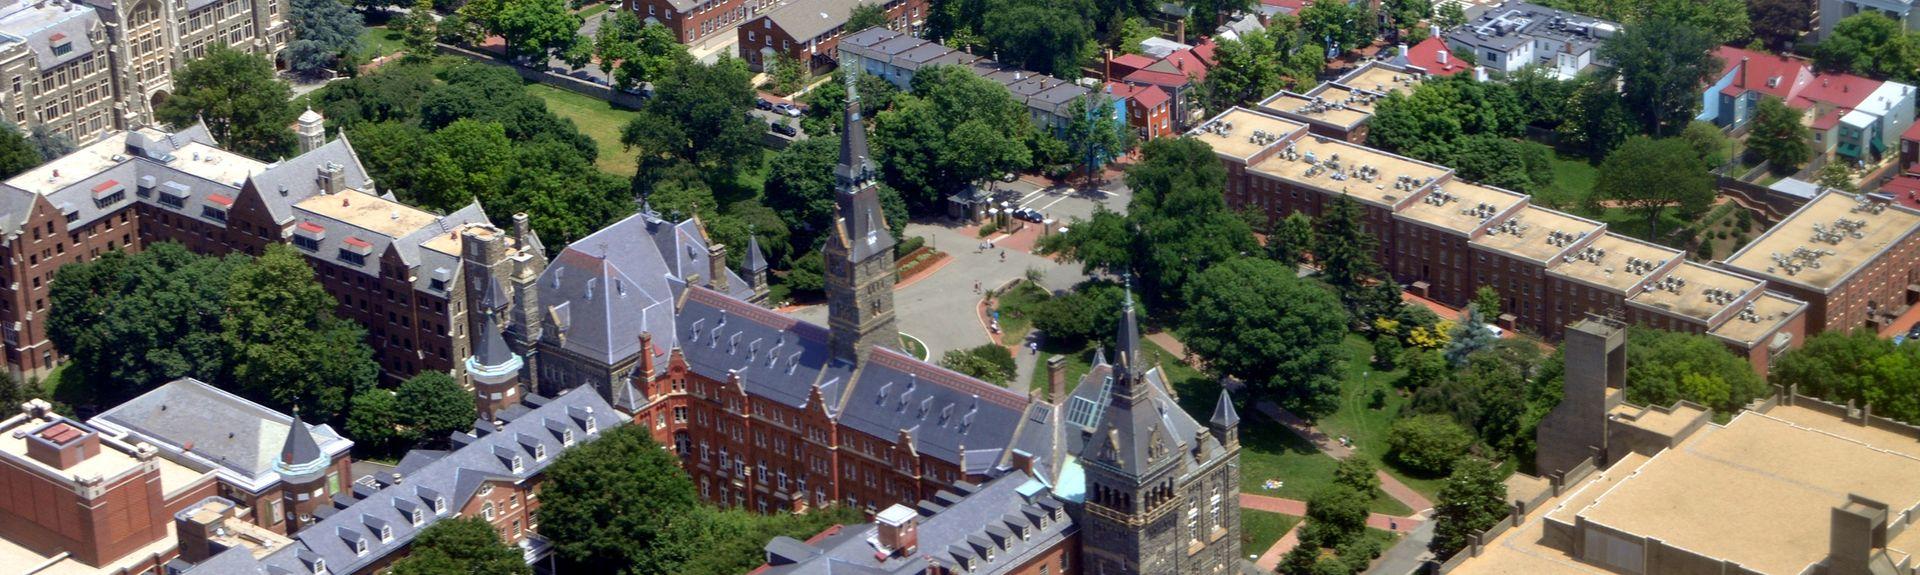 Georgetown, Washington, District of Columbia, Verenigde Staten